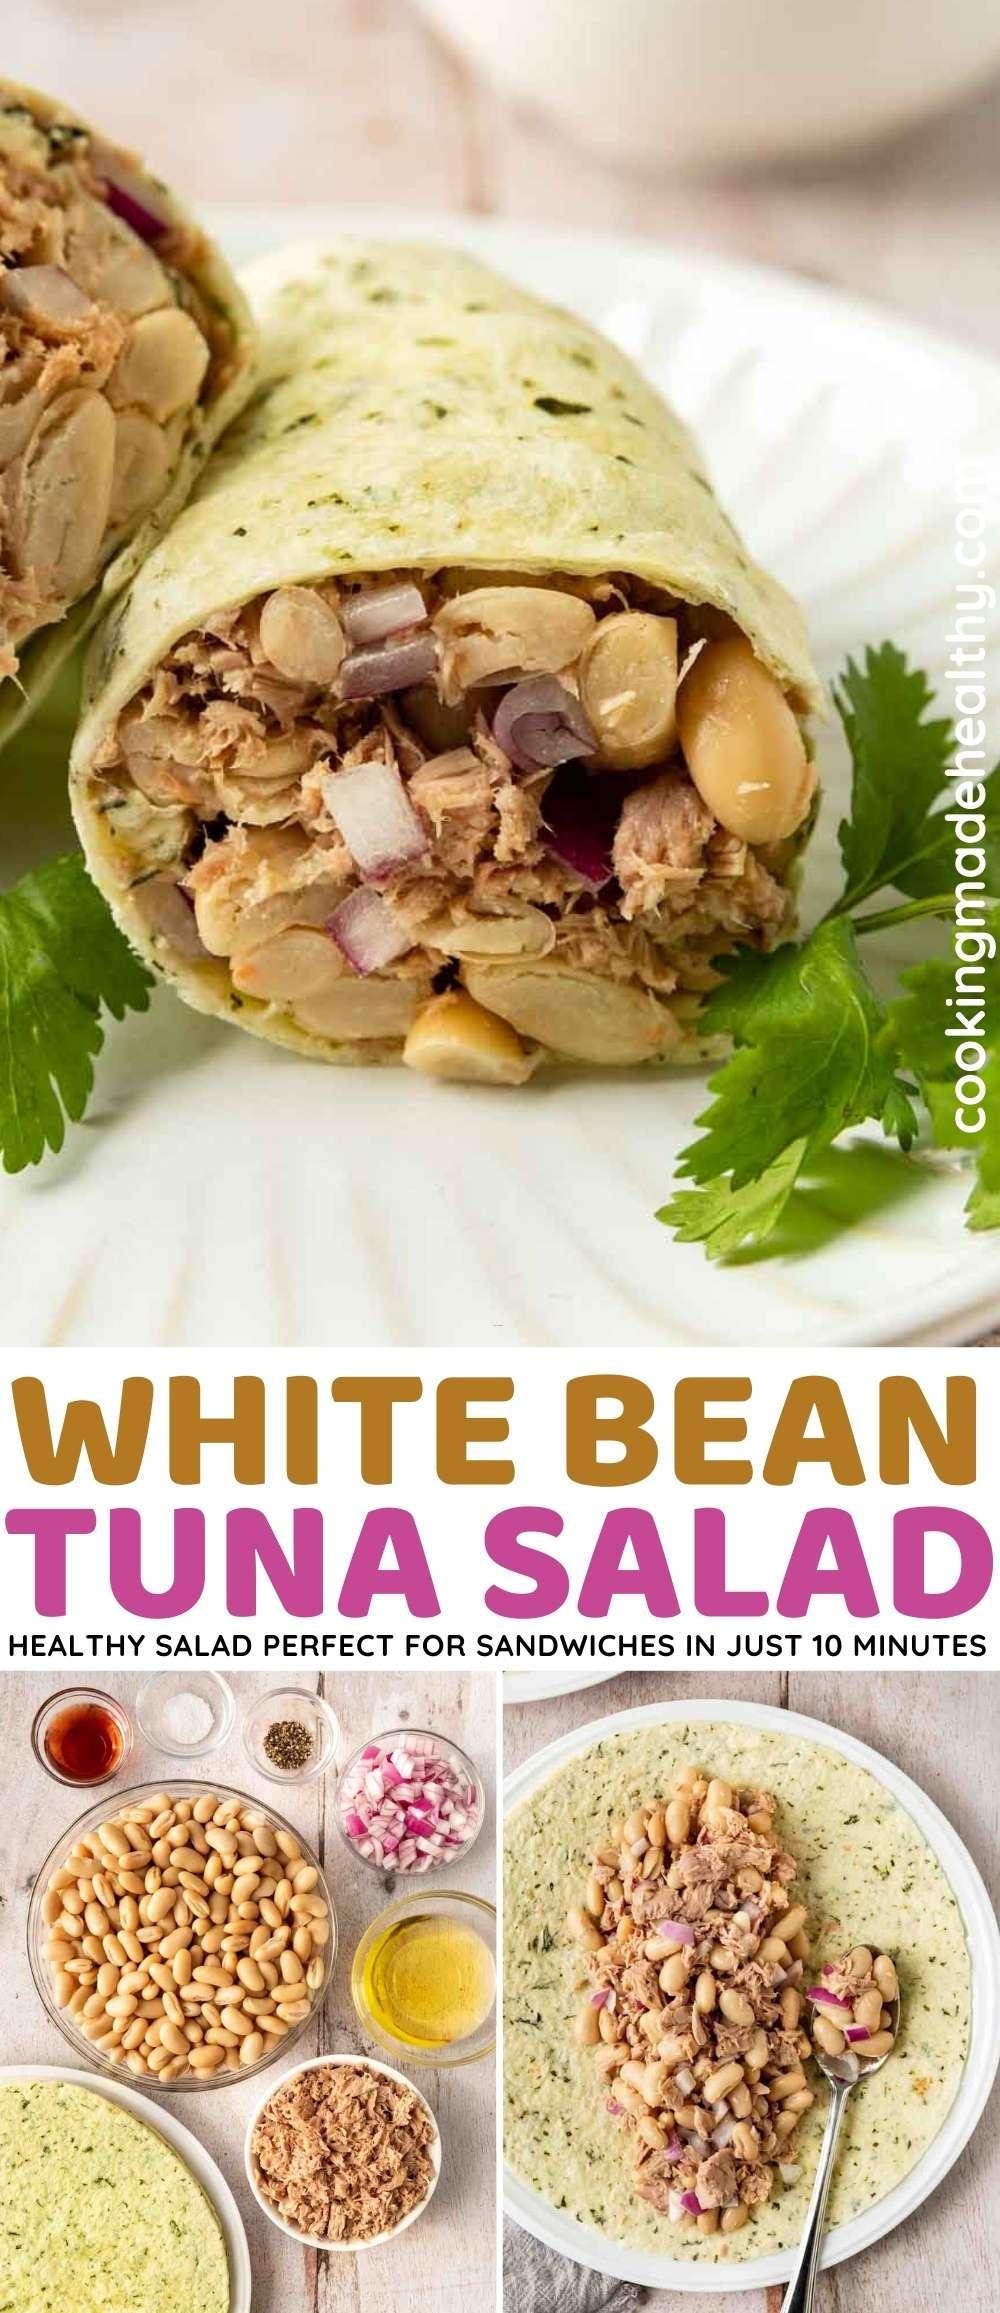 White Bean Tuna Salad collage